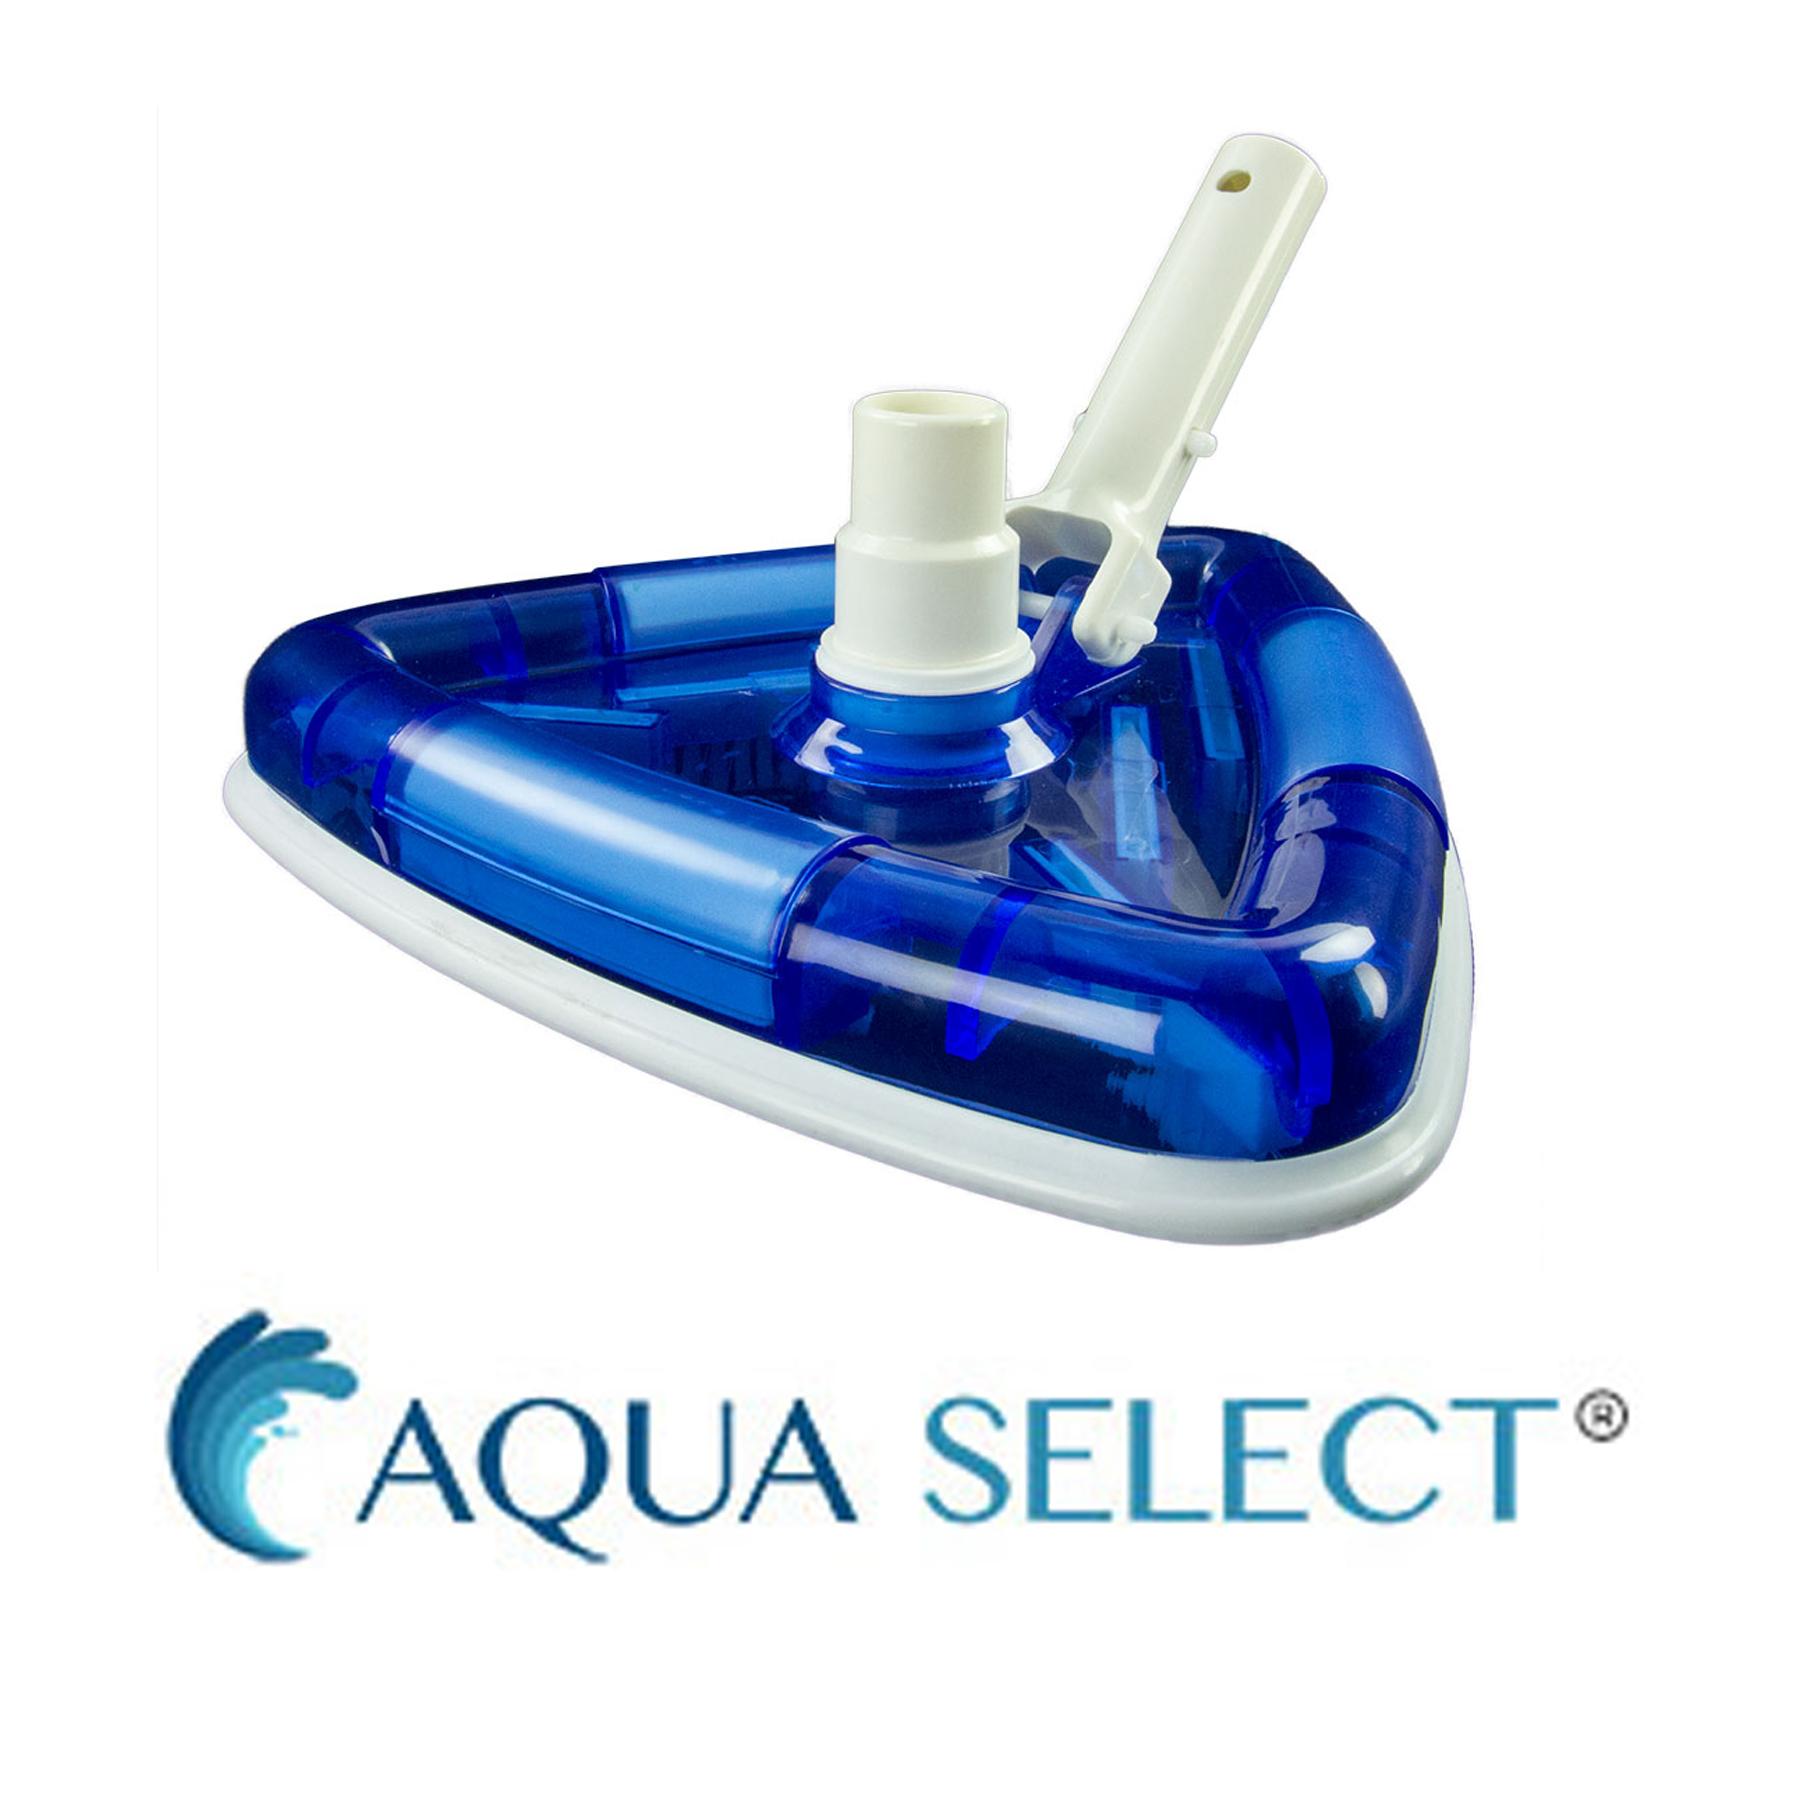 Details about Aqua Select See-Thru Triangular Swimming Pool Vacuum Head w/  Brushes